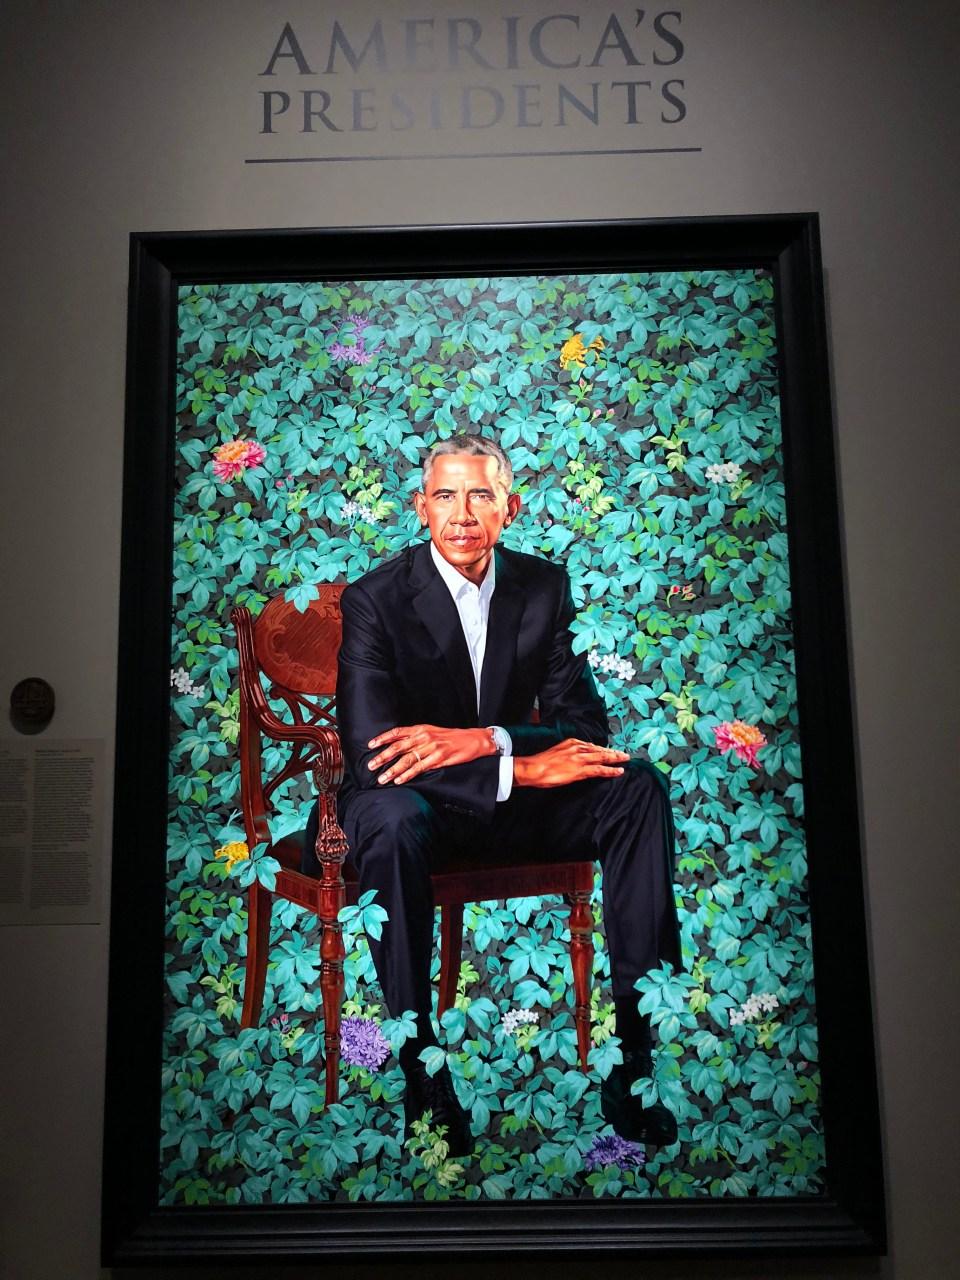 National Portrait Gallery - Barack Obama